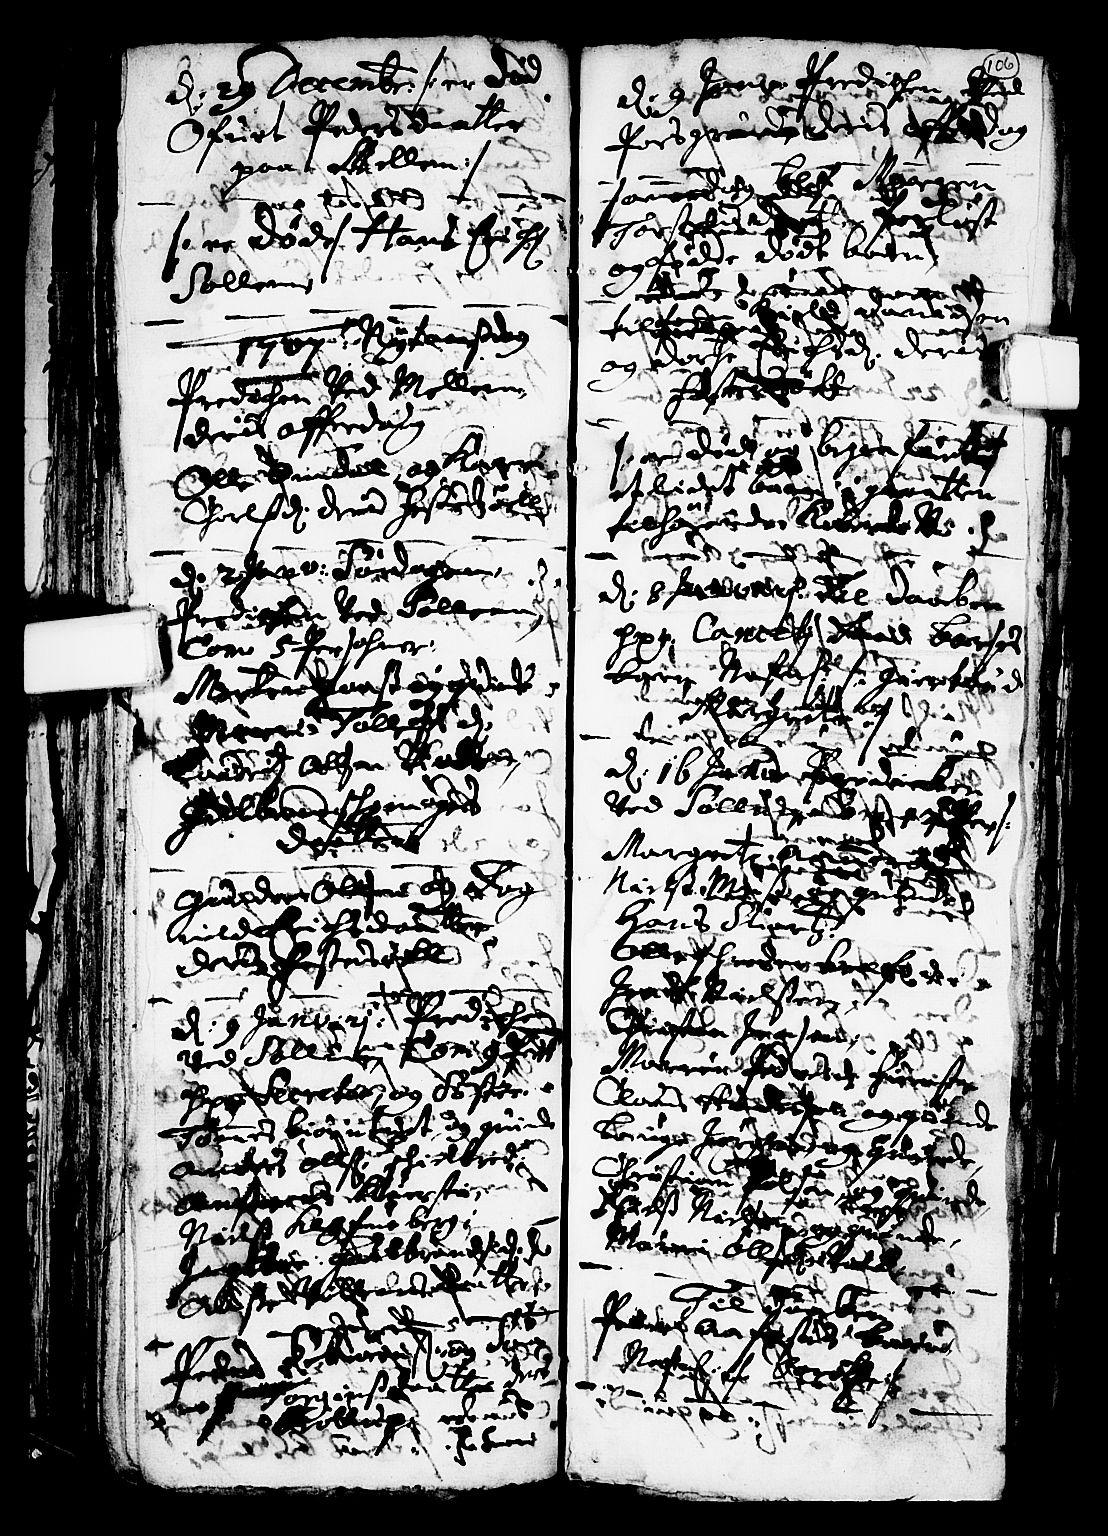 SAKO, Solum kirkebøker, F/Fa/L0001: Ministerialbok nr. I 1, 1701-1716, s. 106